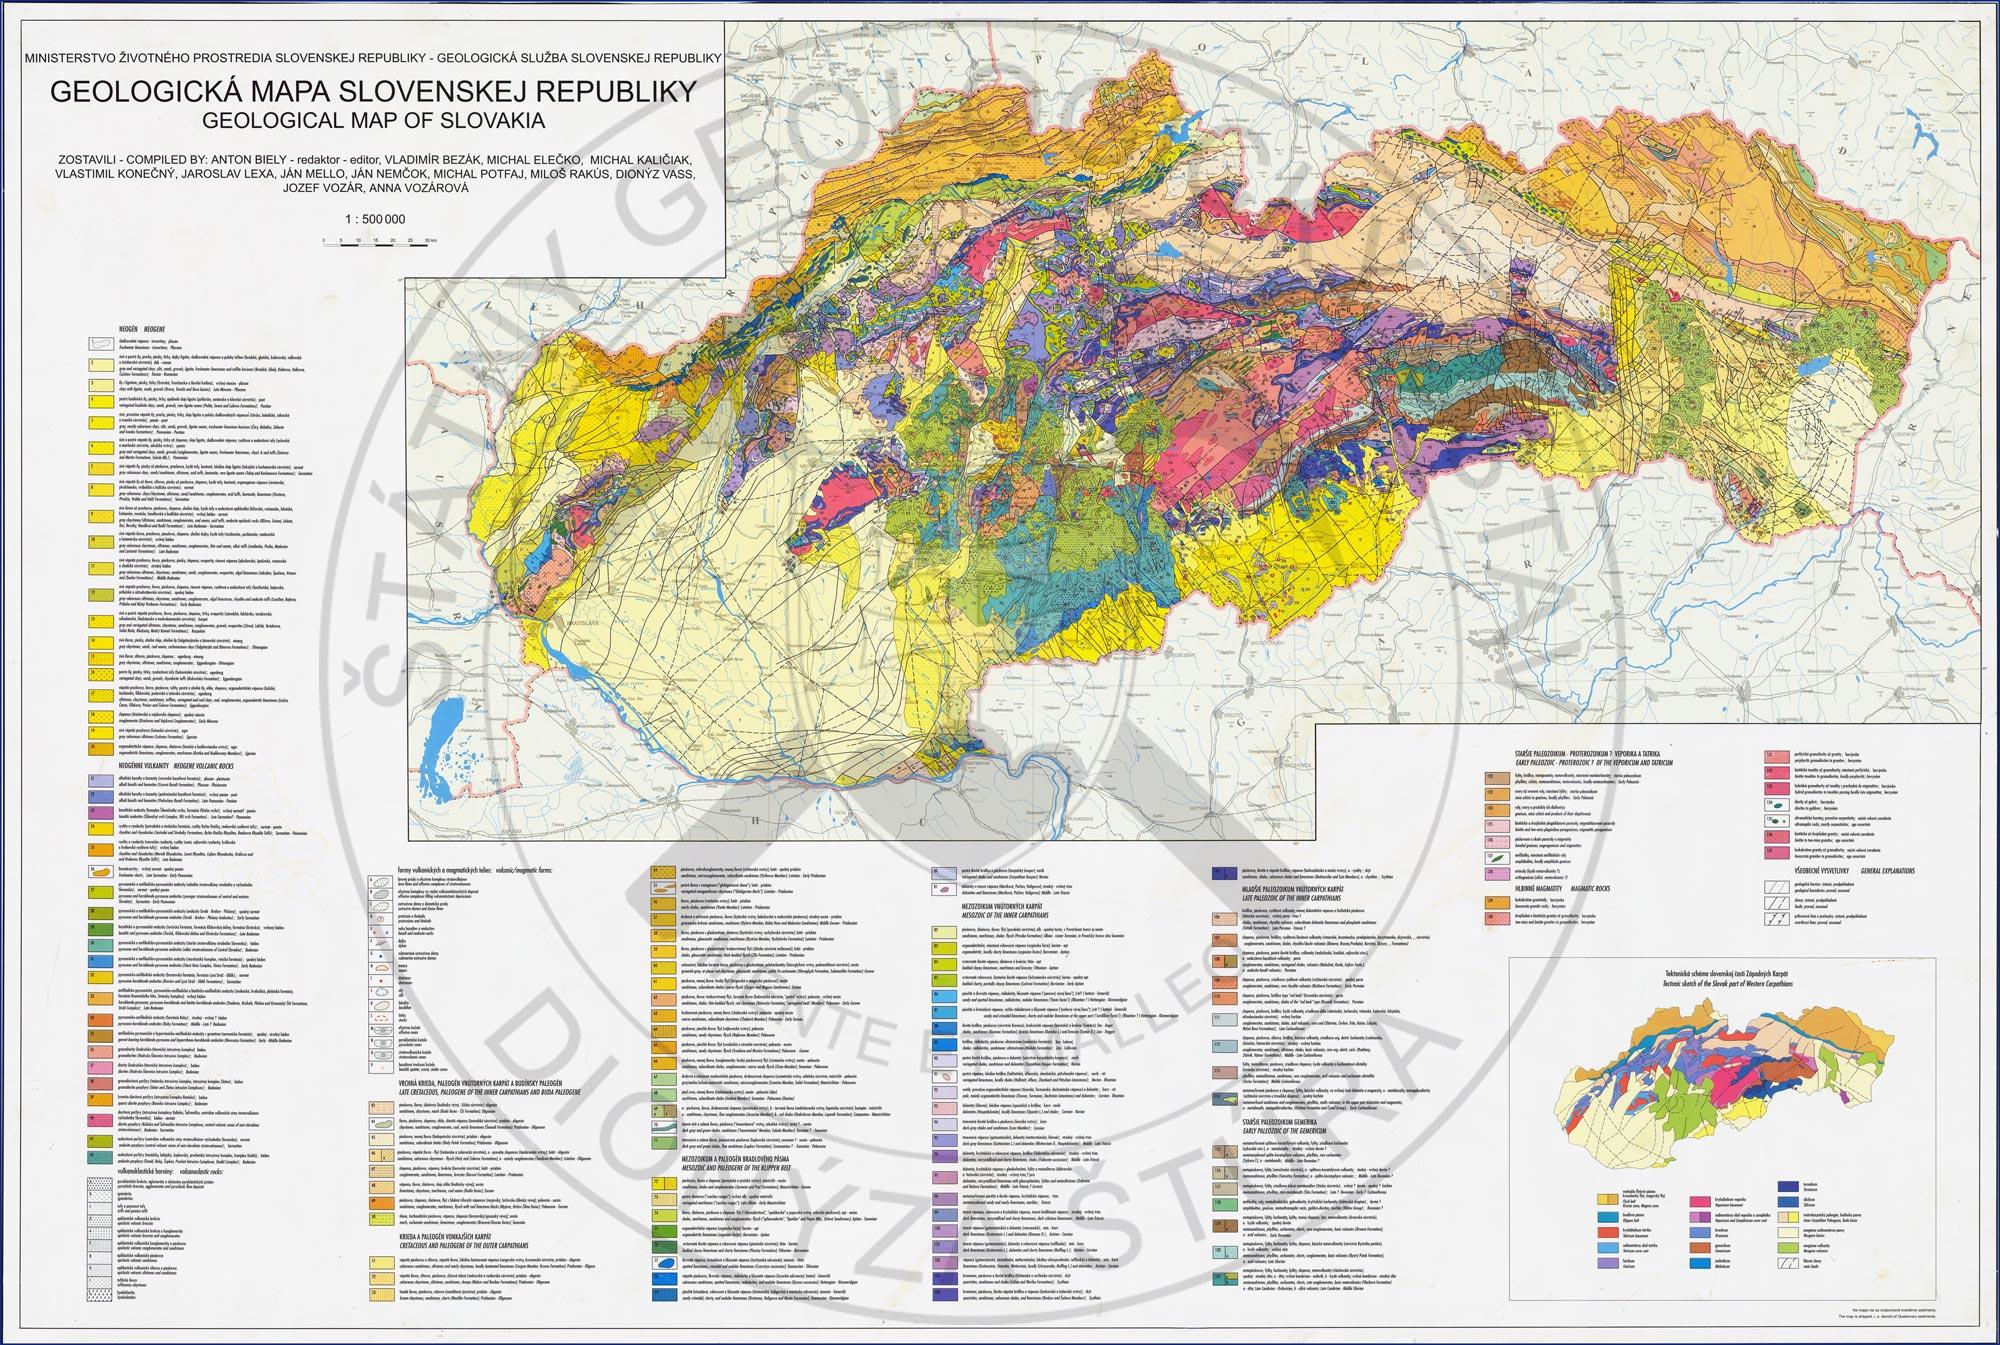 Geological Maps Sgids Statny Geologicky Ustav Dionyza Stura